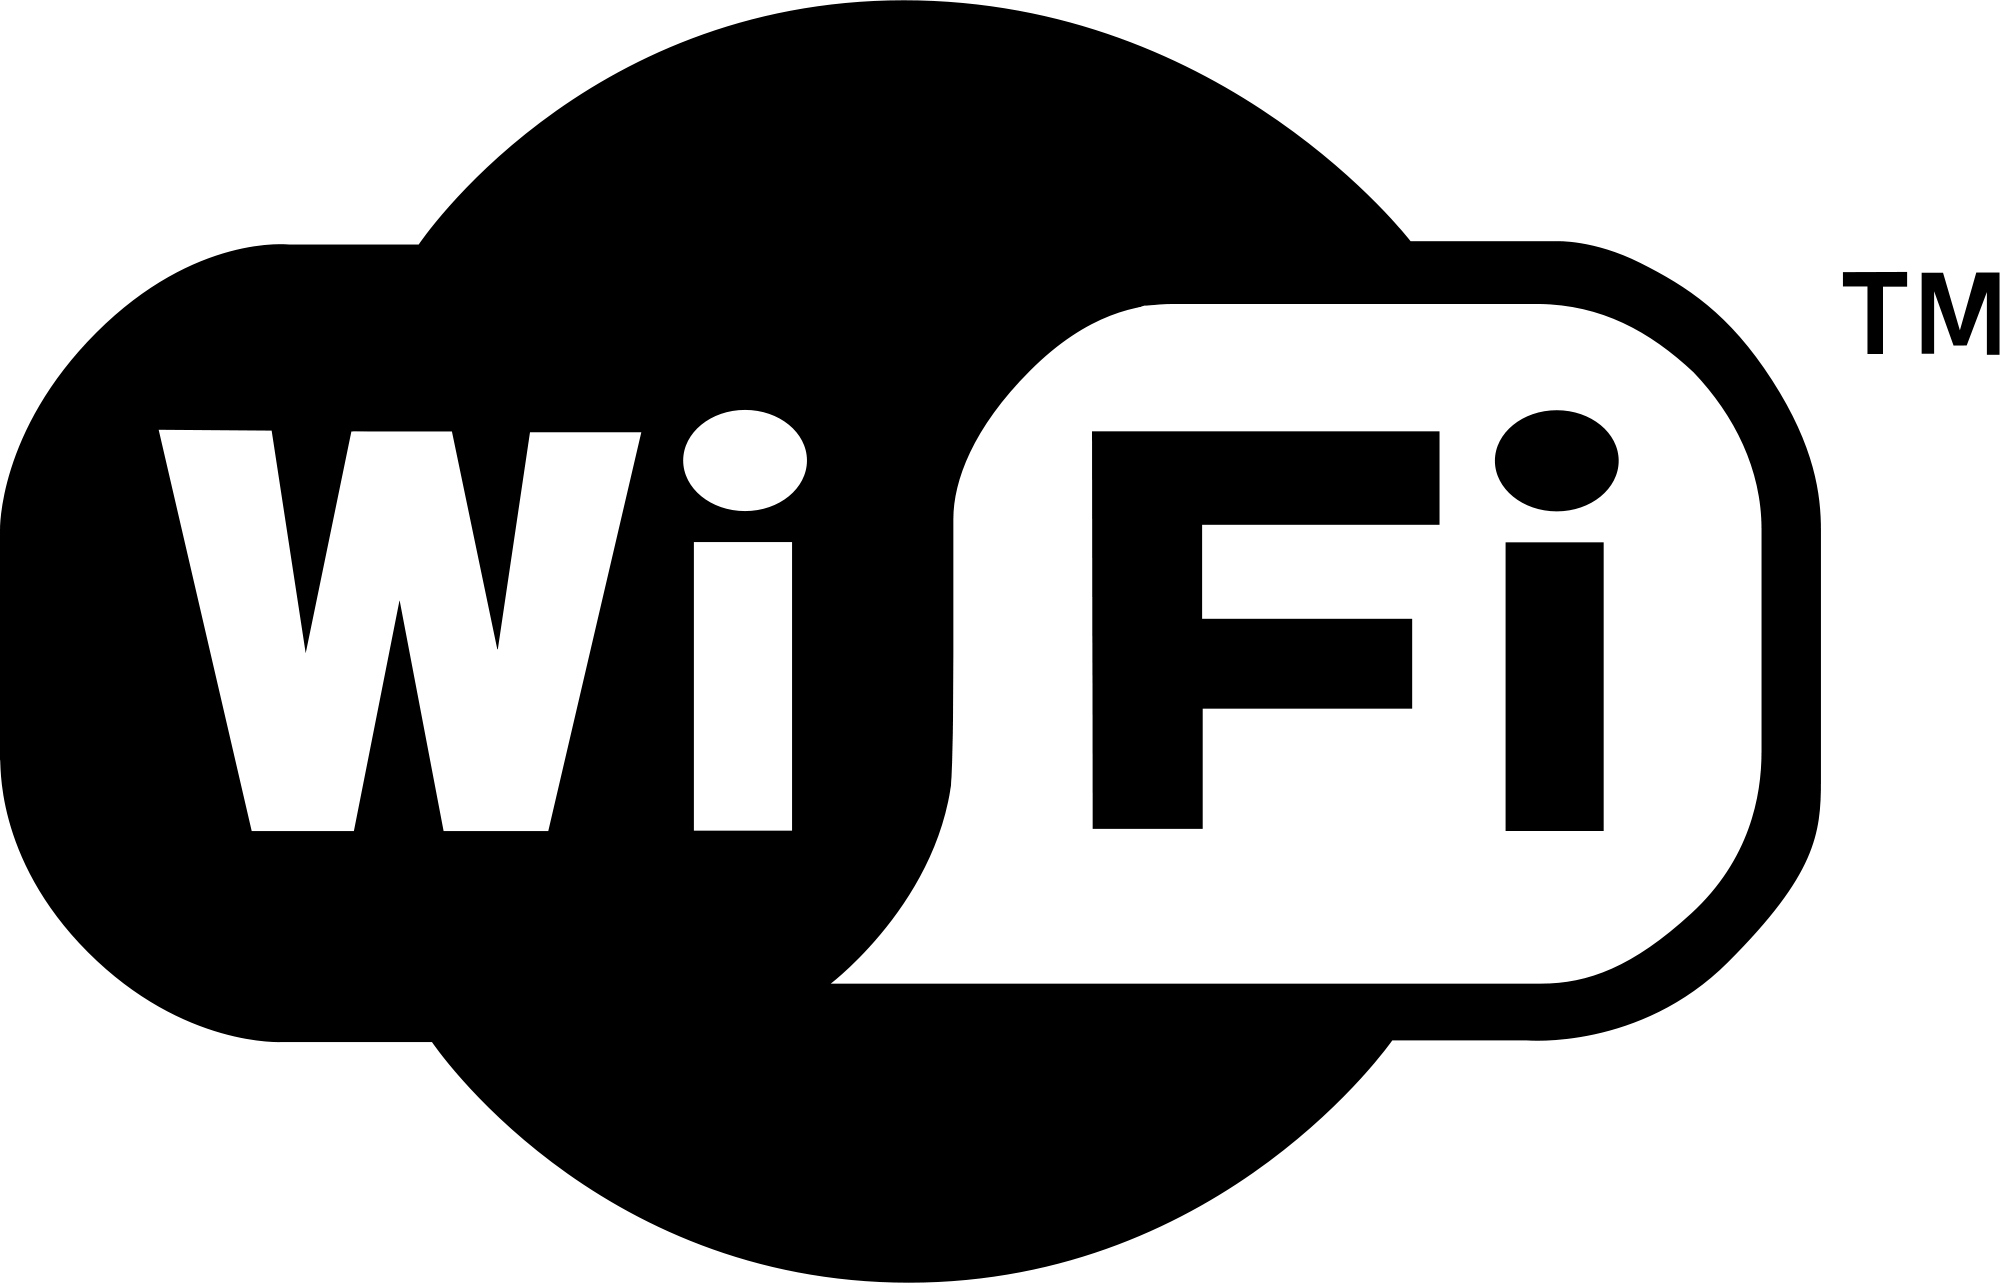 Logo svg #5, Download drawings